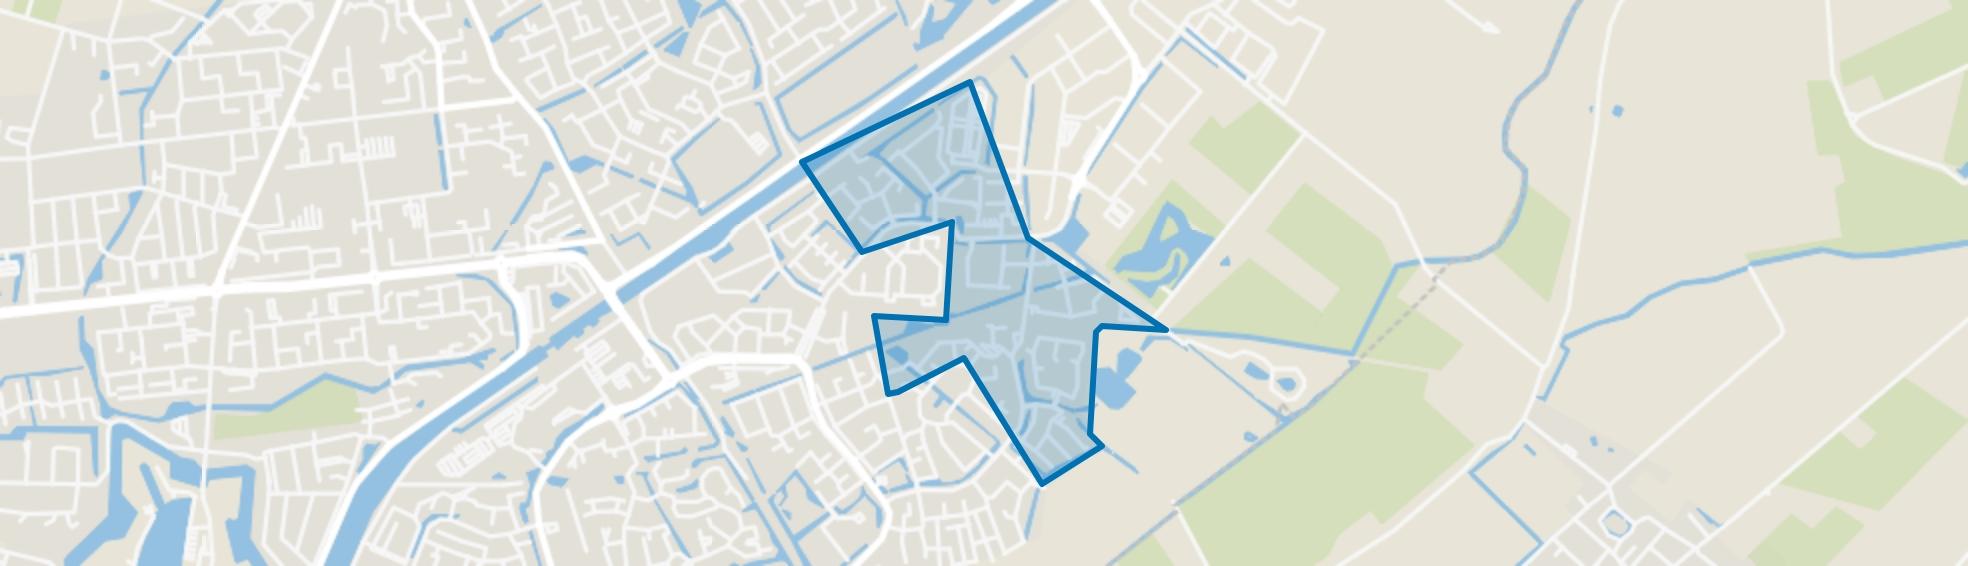 Morgen Stont, Hellevoetsluis map